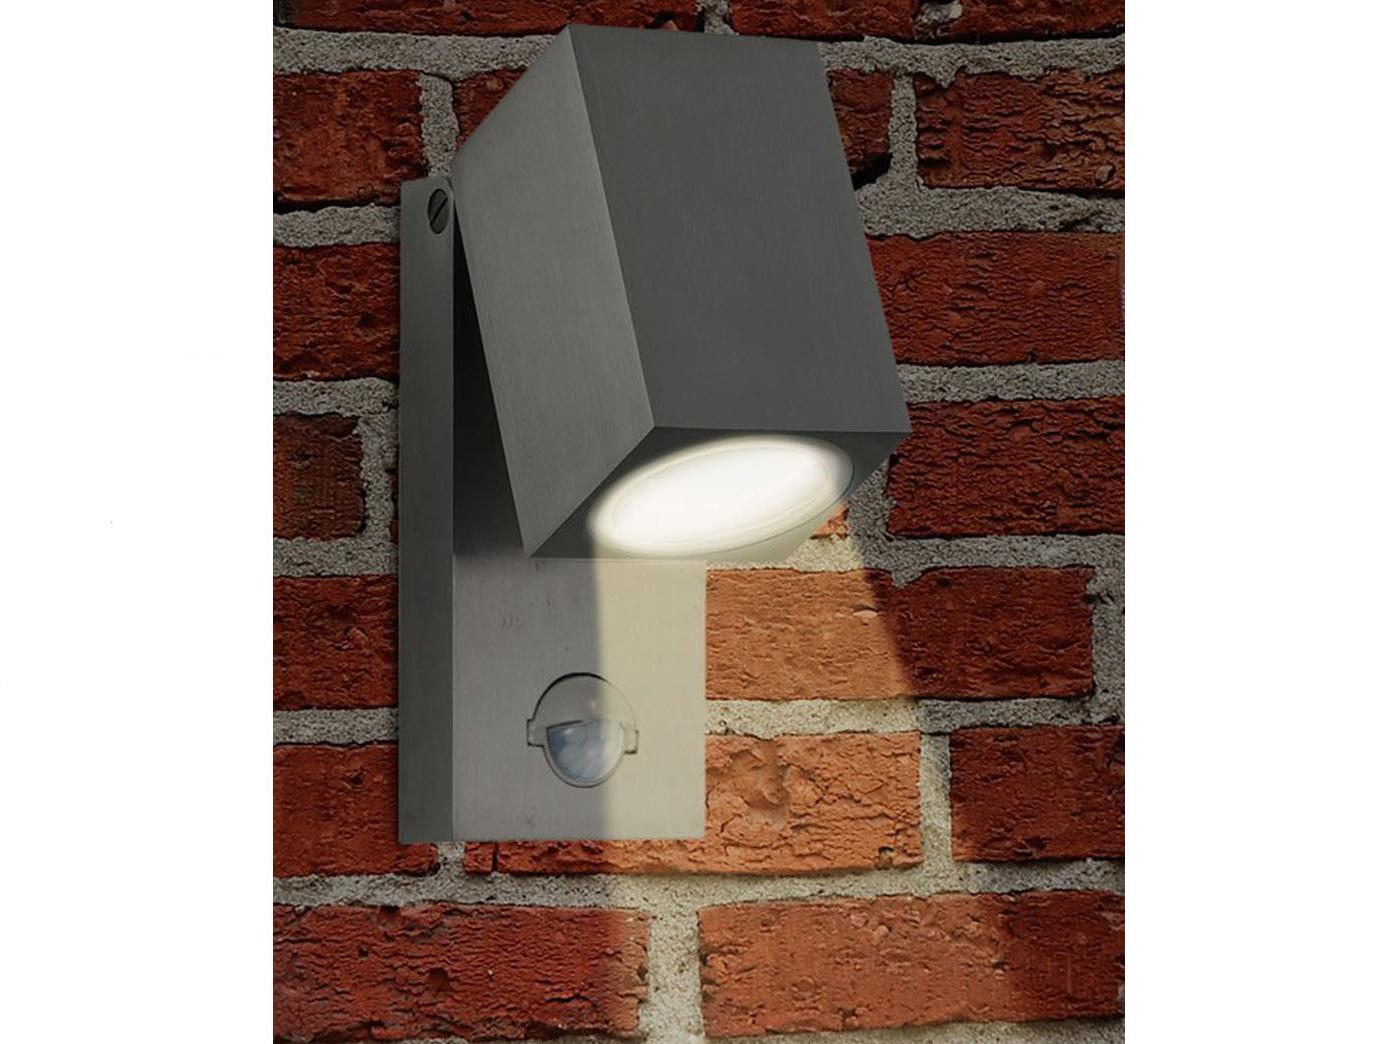 ranex au enlampe mit led bewegungsmelder d mmerungssensor fassadenbeleuchtung ebay. Black Bedroom Furniture Sets. Home Design Ideas